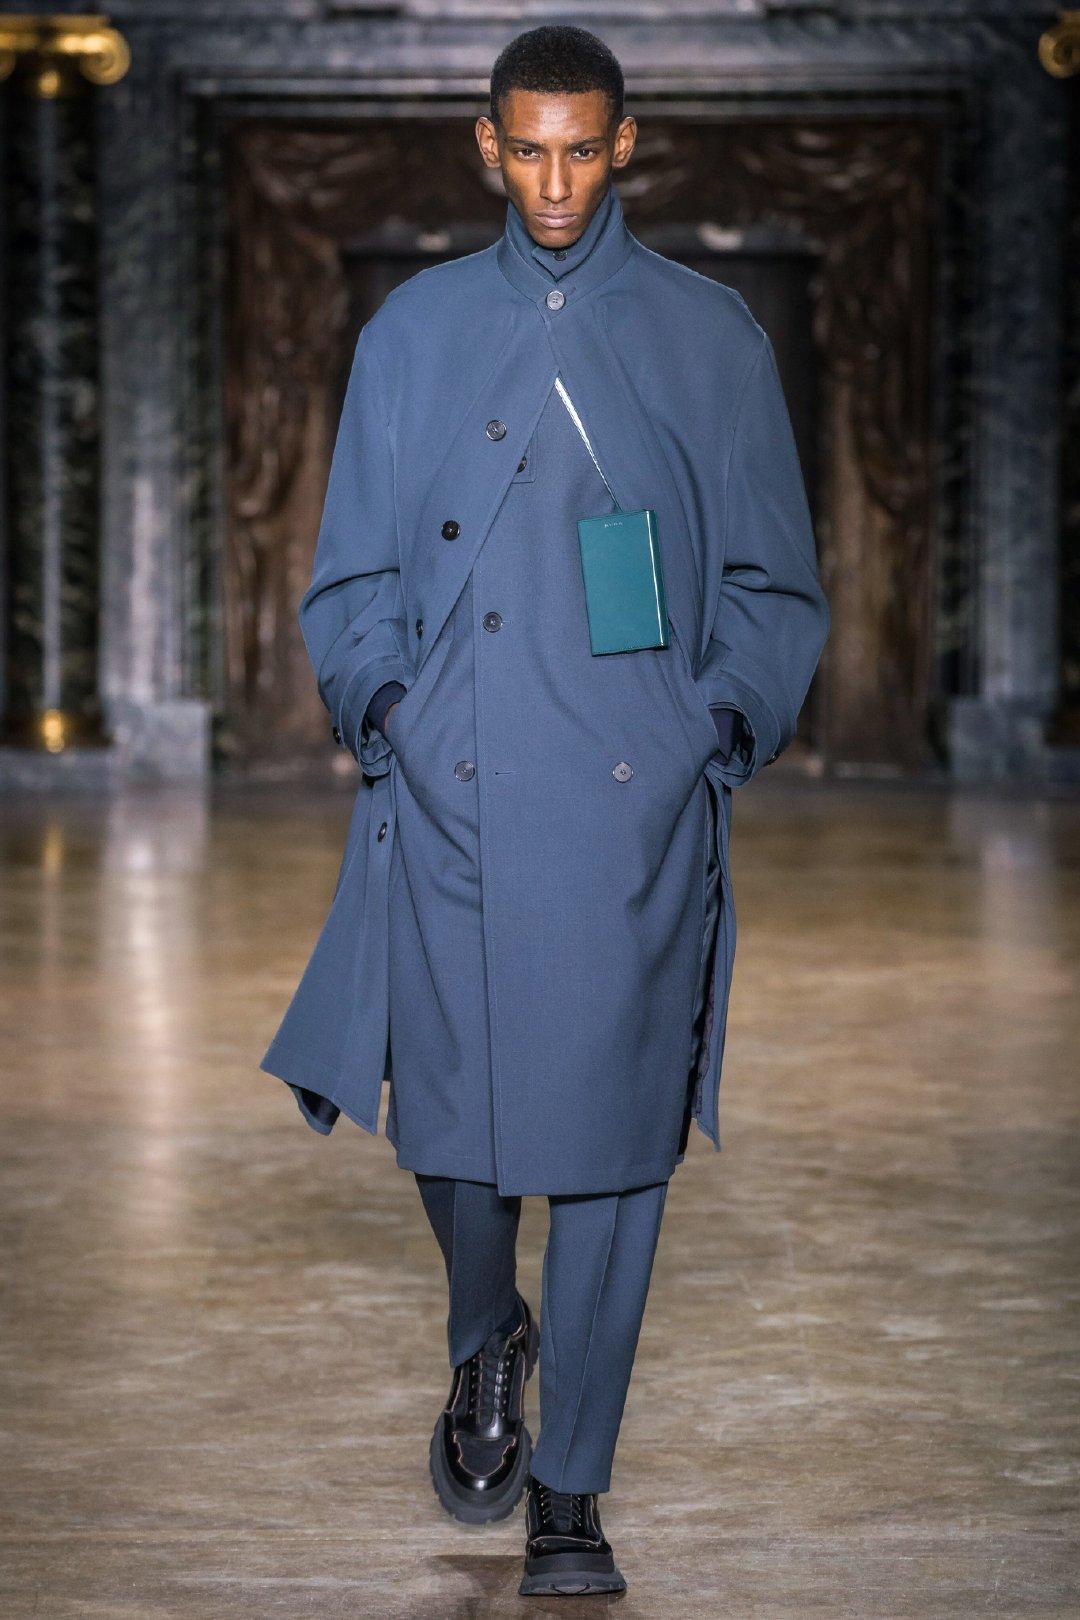 @JilSander吉尔桑徳 2019秋冬男装系列在延续经典的同时强调前瞻的自